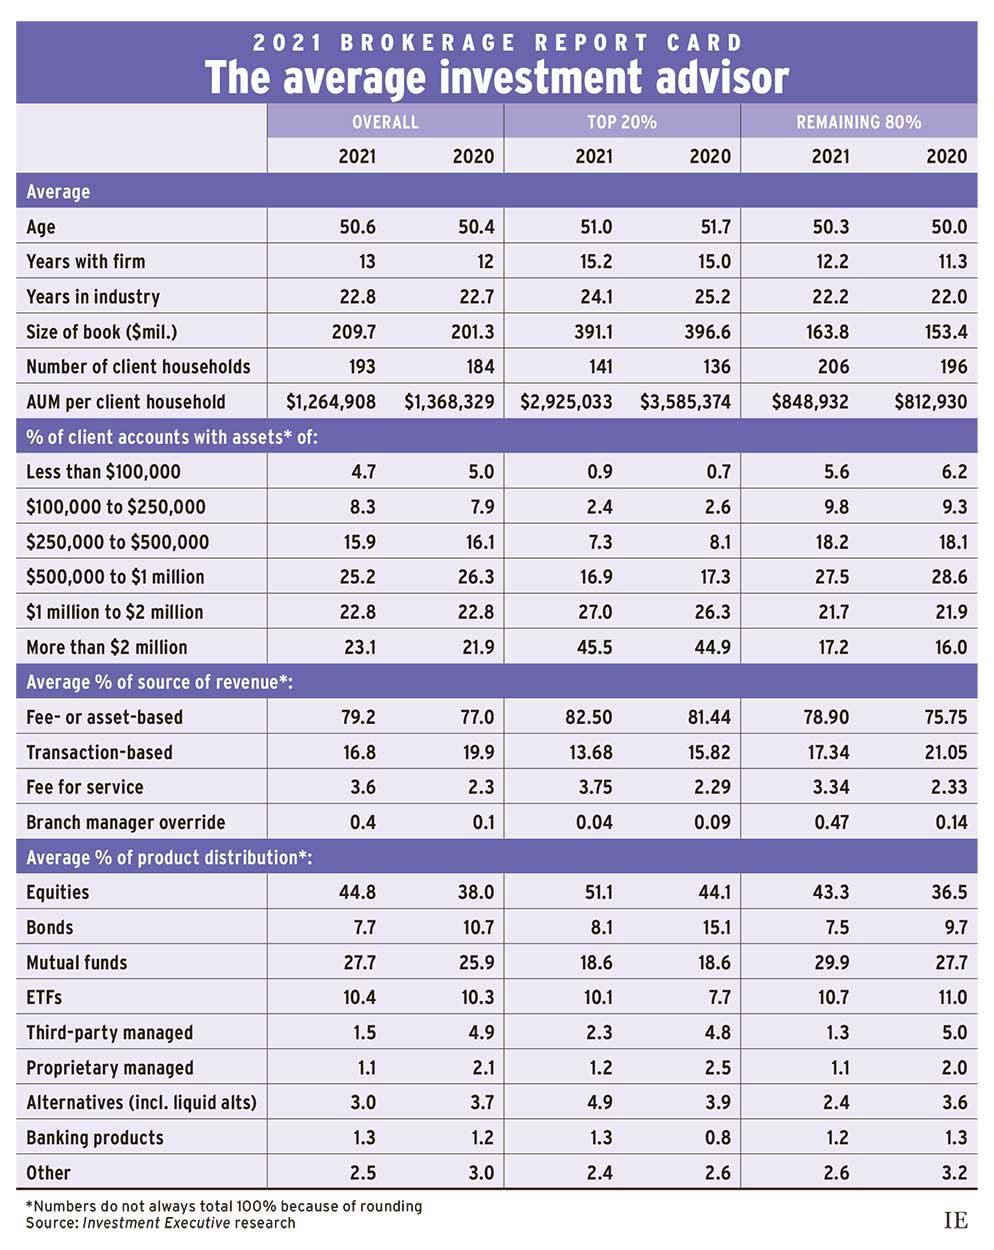 2021 Brokerage Report Card: The average investment advisor